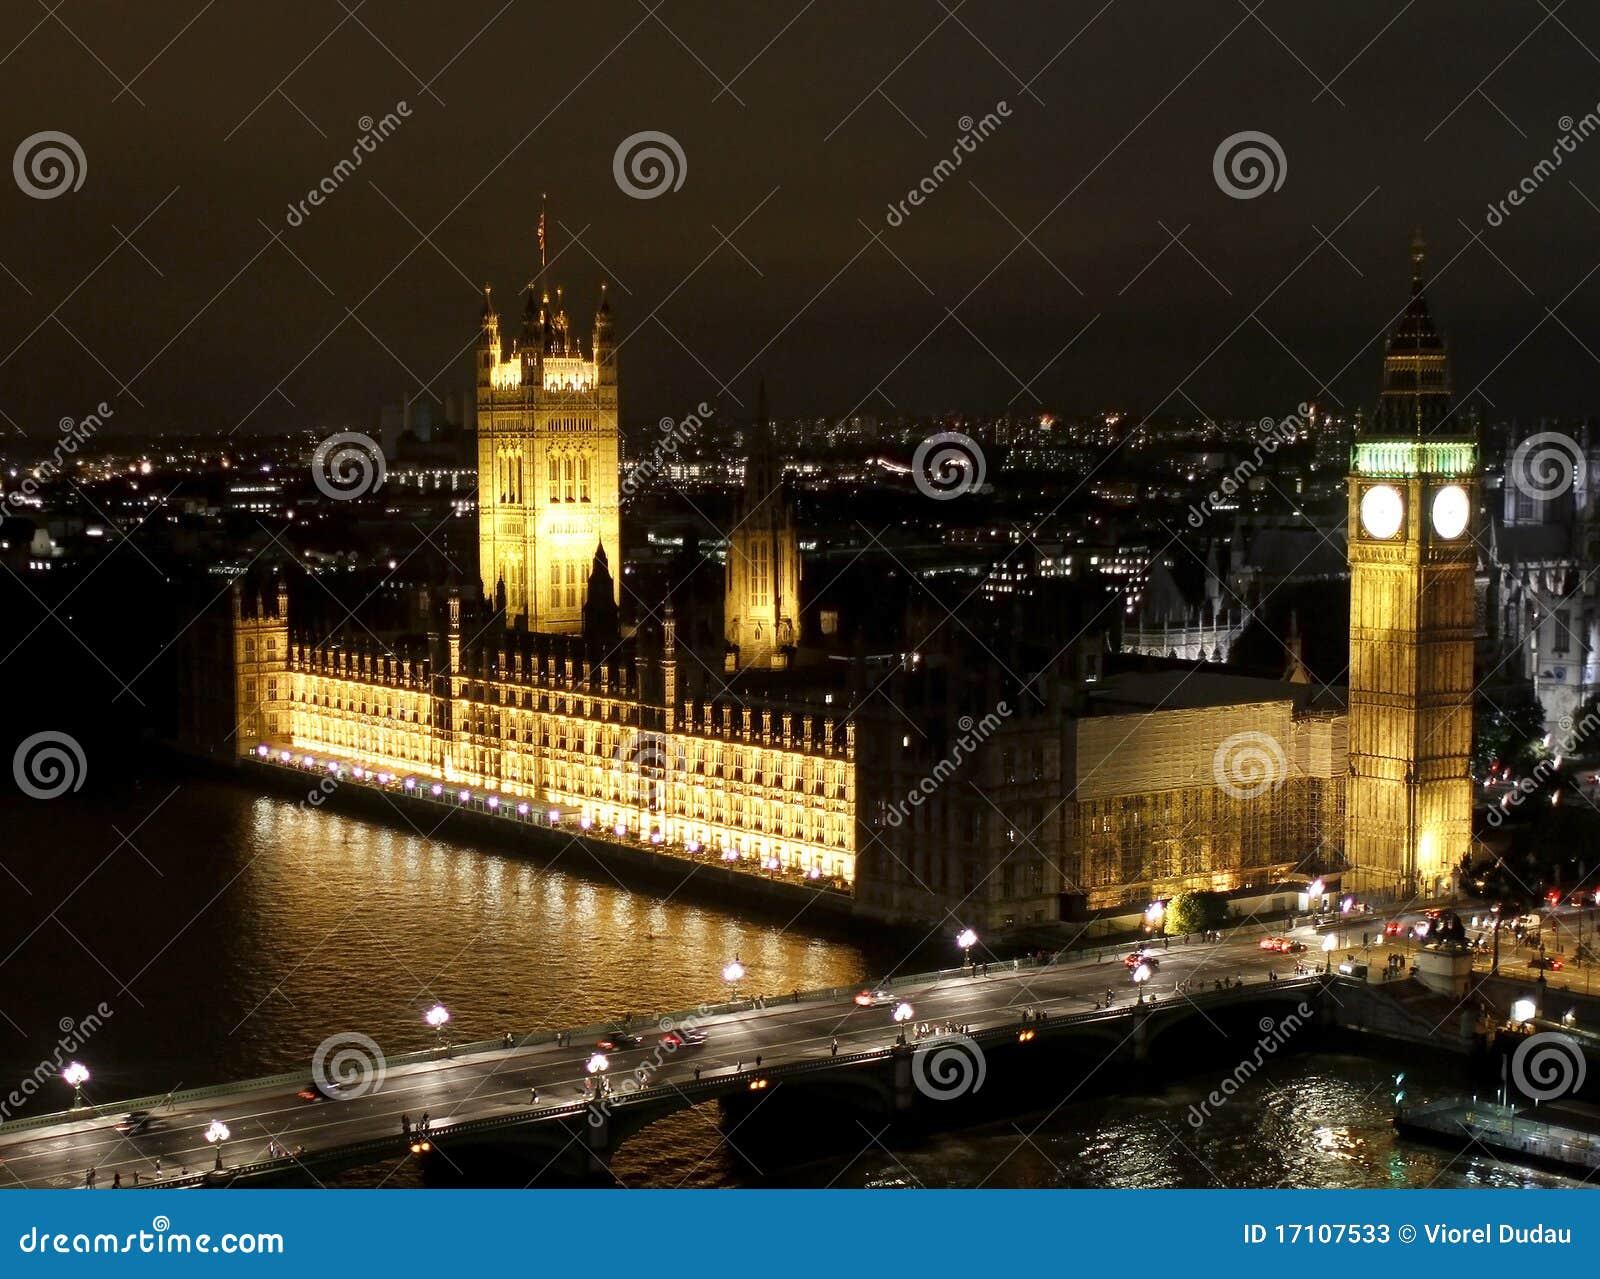 Scène de nuit de Londres, grand Ben et Abbaye de Westminster